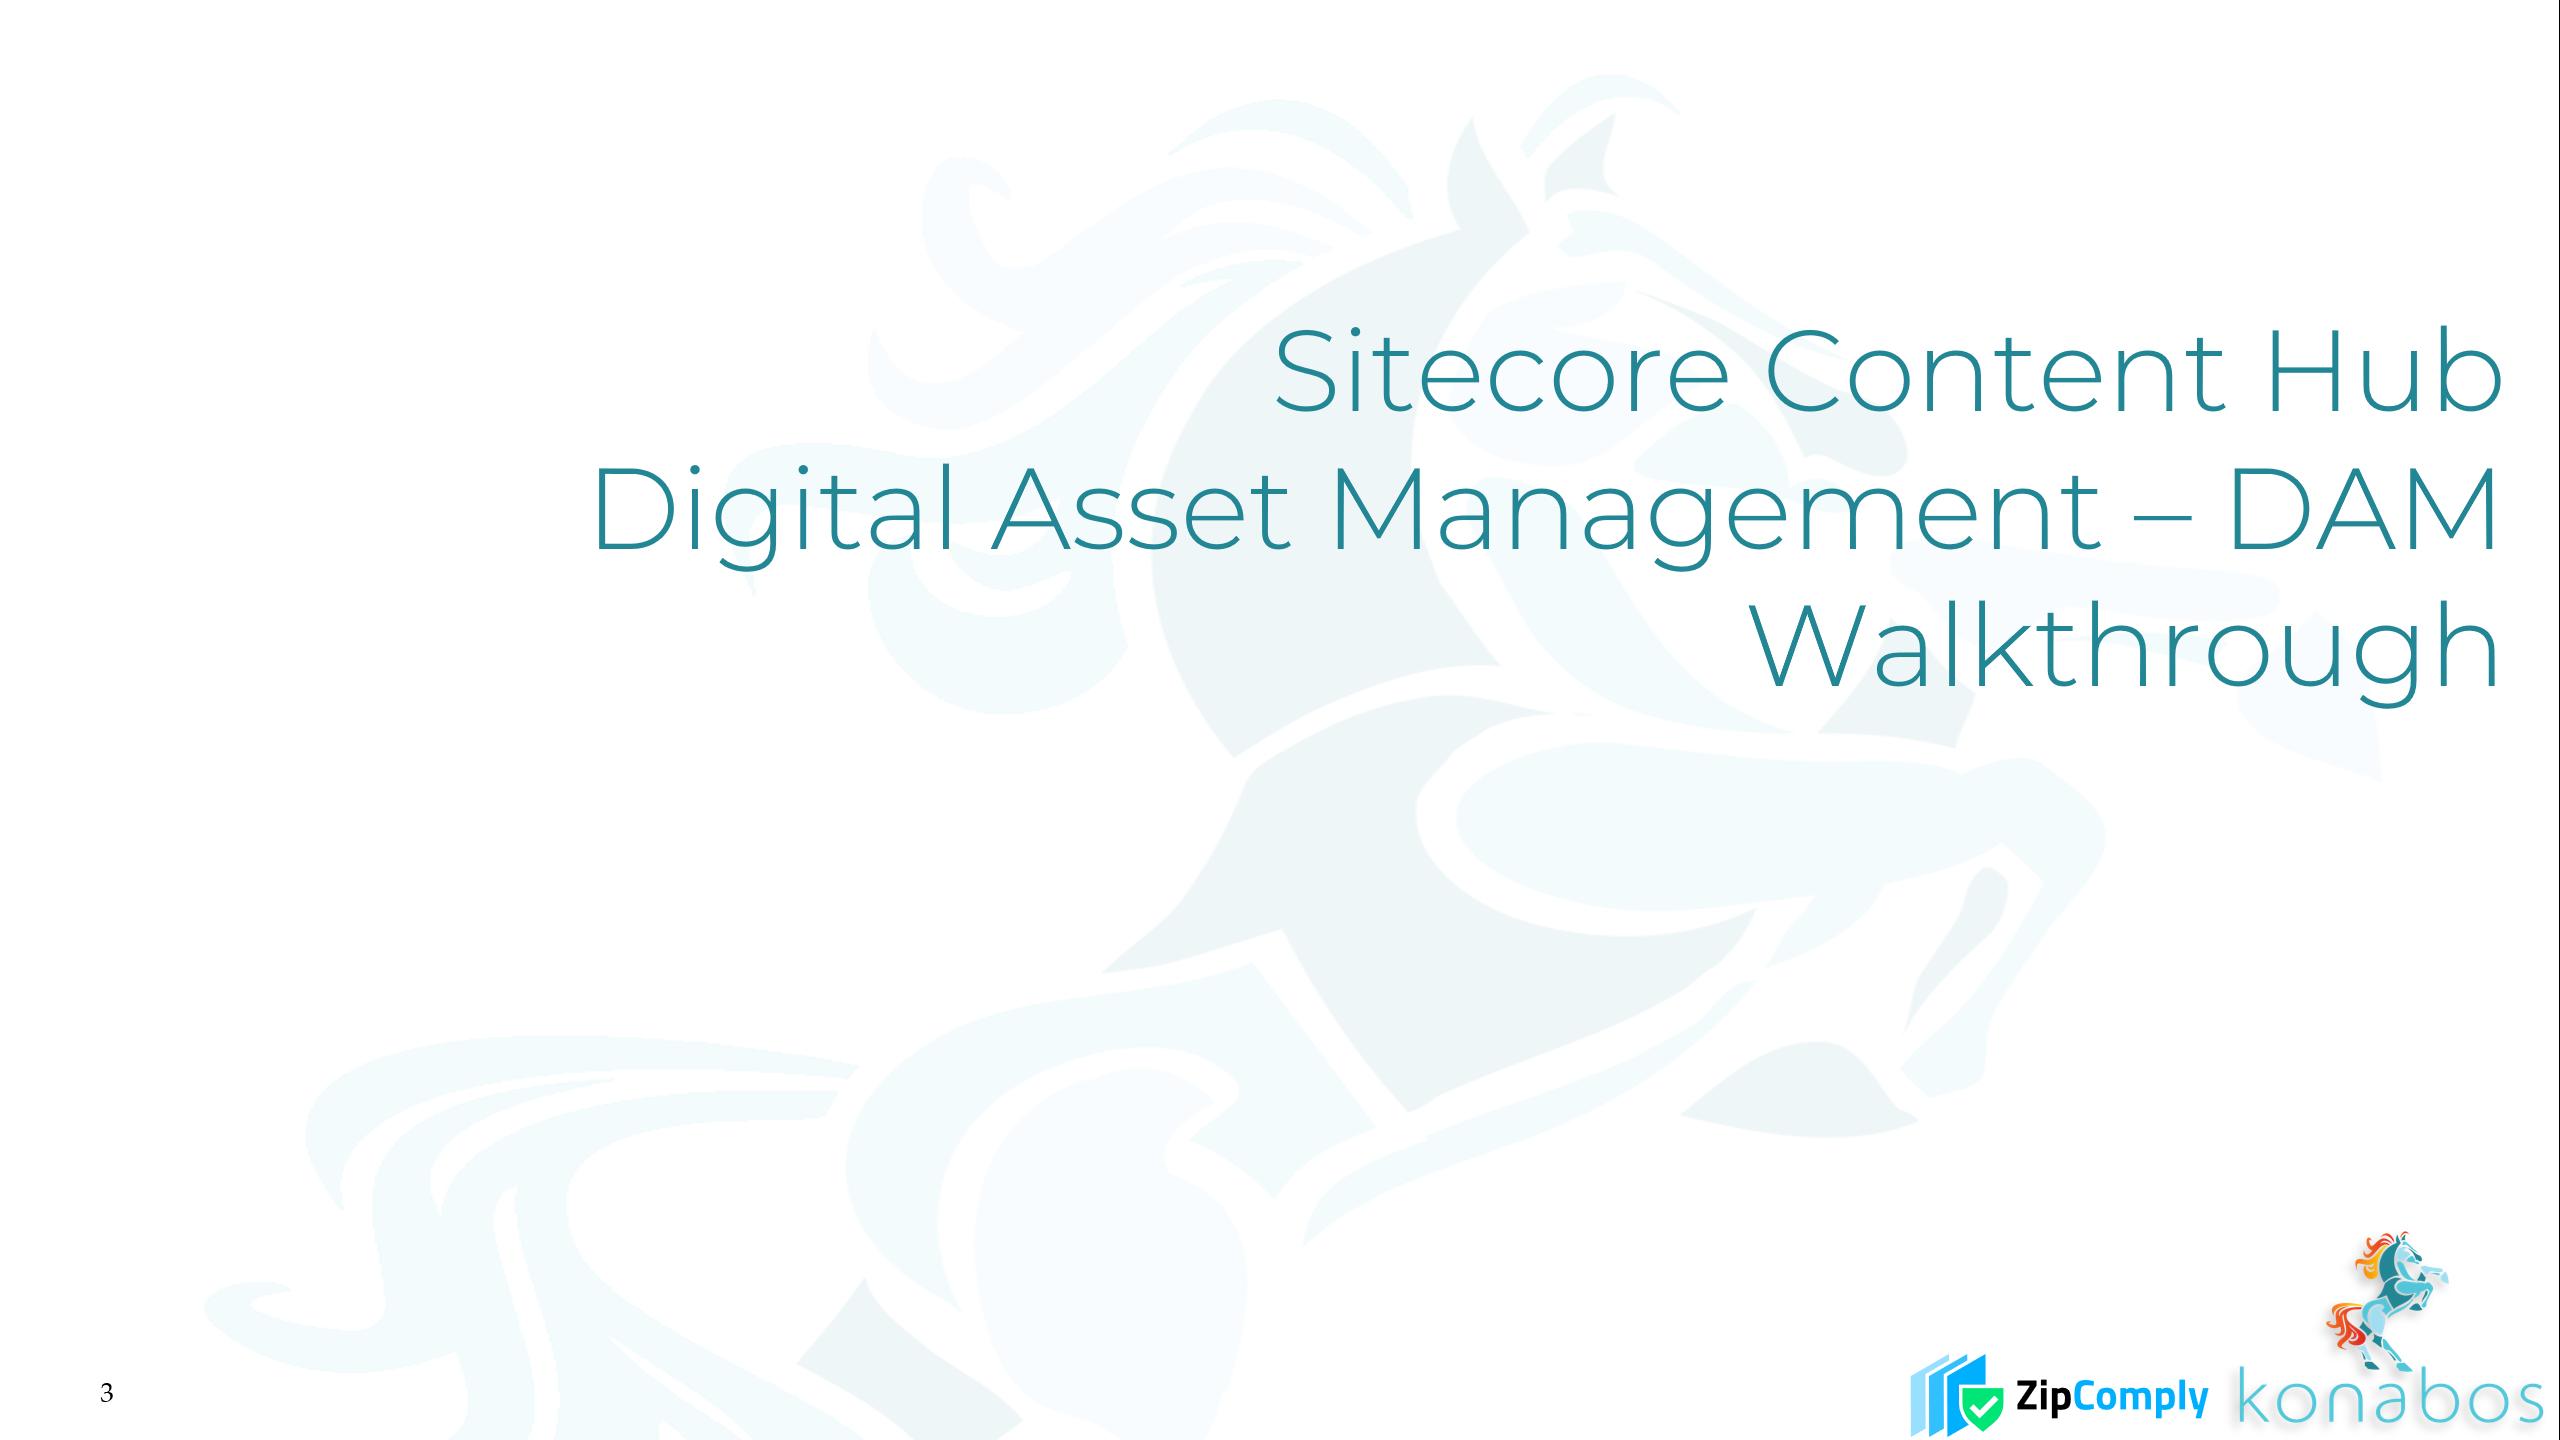 Sitecore Content Hub - Digital Asset Management - DAM - Walkthrough